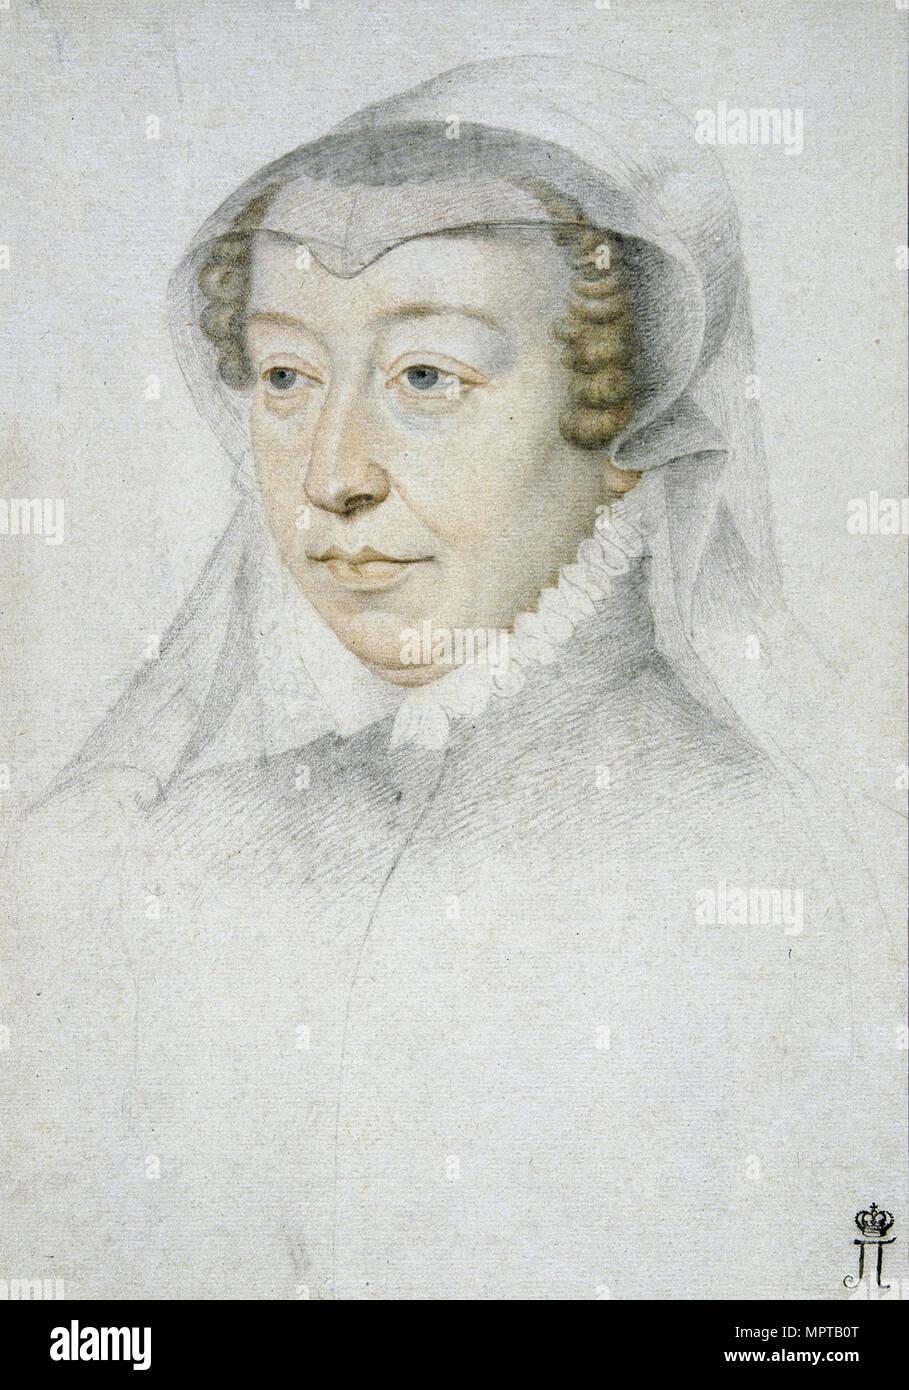 Portrait von Katharina de' Medici (1519-1589). Stockfoto